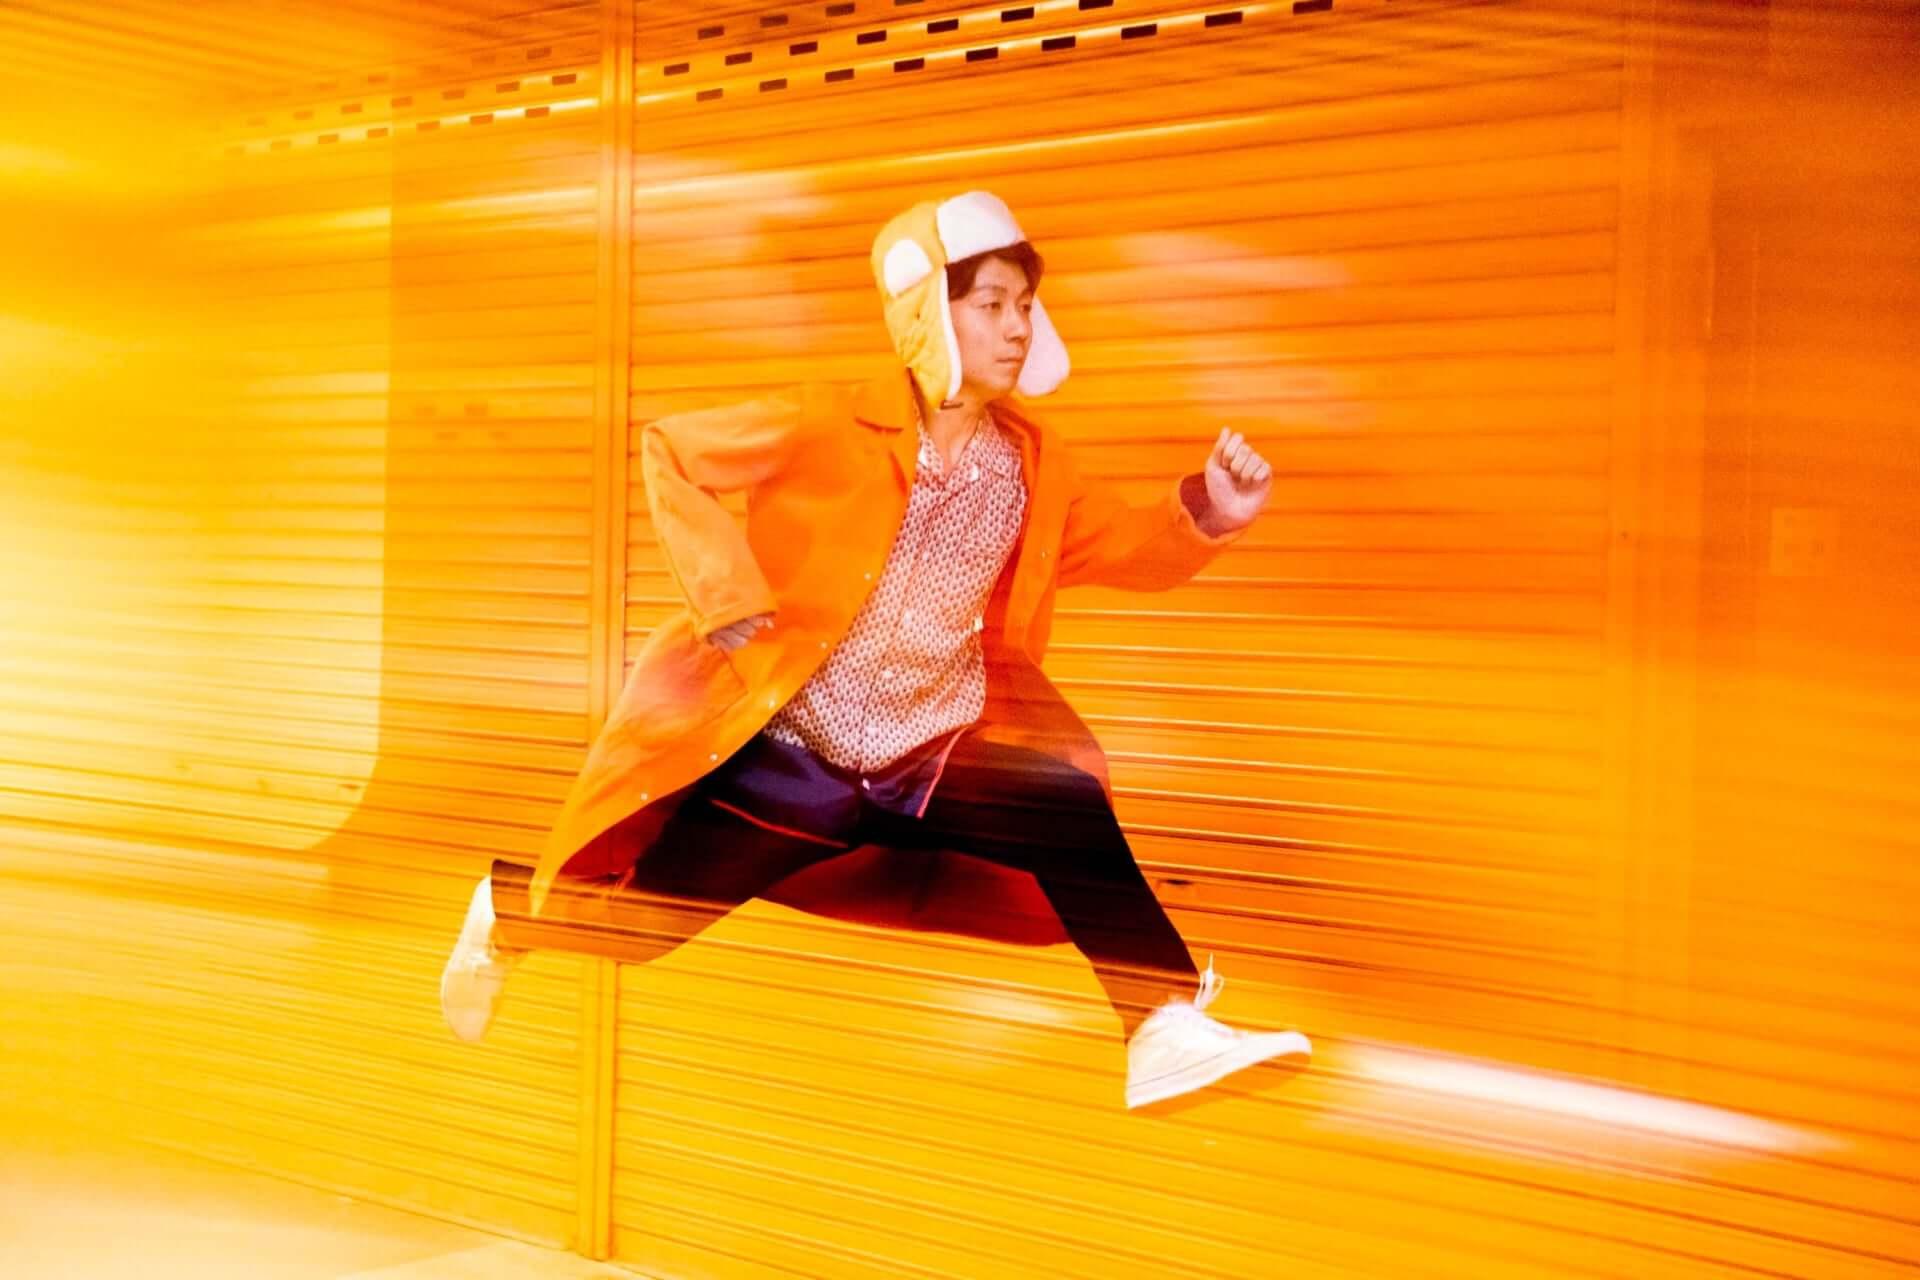 <YABITO FESTIVAL 2020>第2弾出演者が発表!やけのはら、どんぐりず、E.scene、SUKISHA、Kenmochi Hidefumiもラインナップ music200917_yabitofestival_3-1920x1280